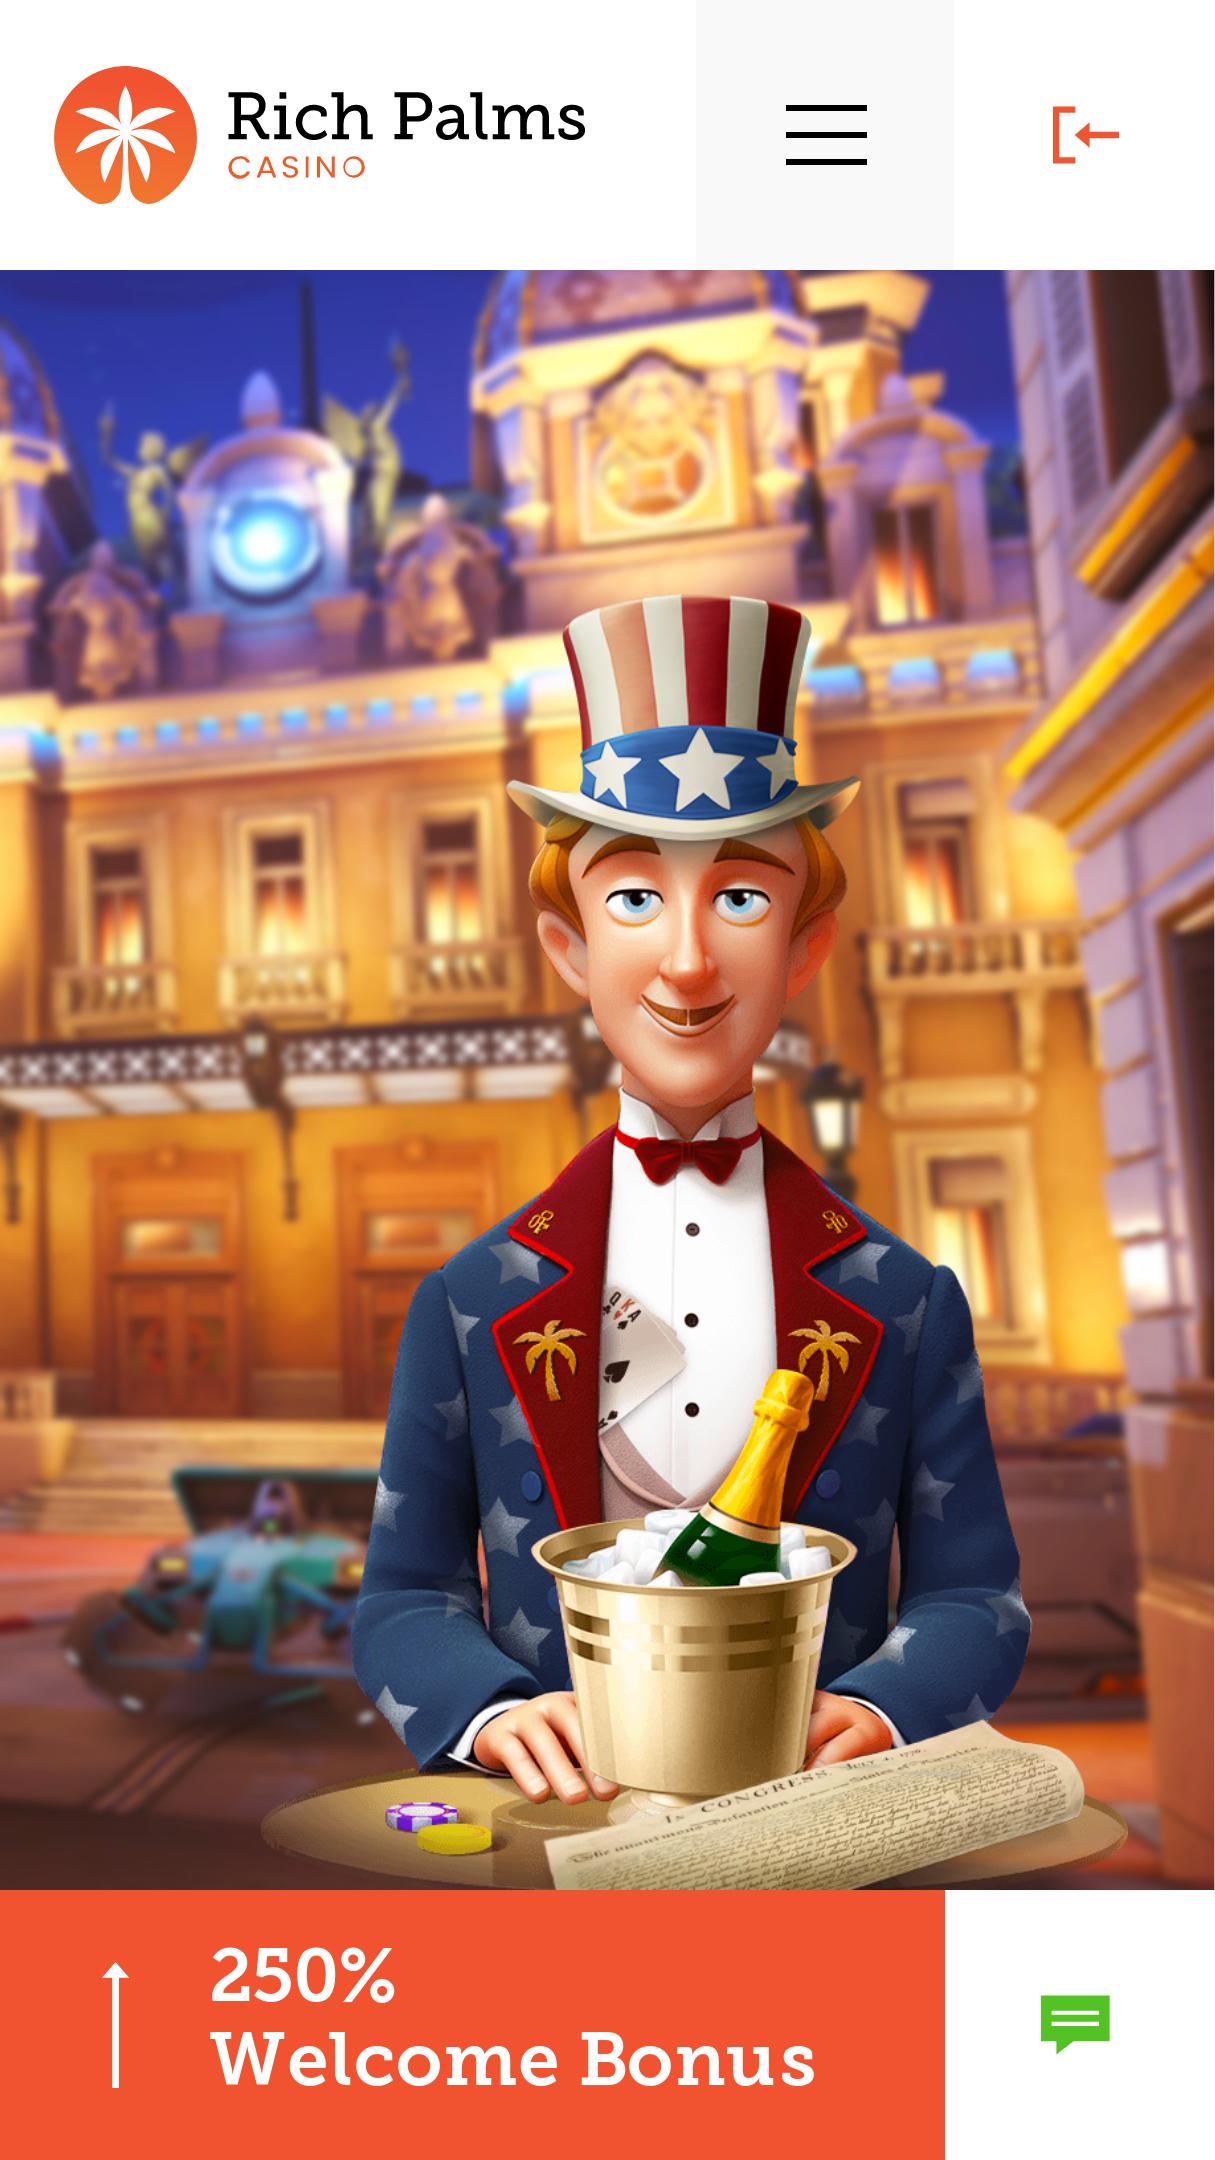 Rich Palms Casino Reviews